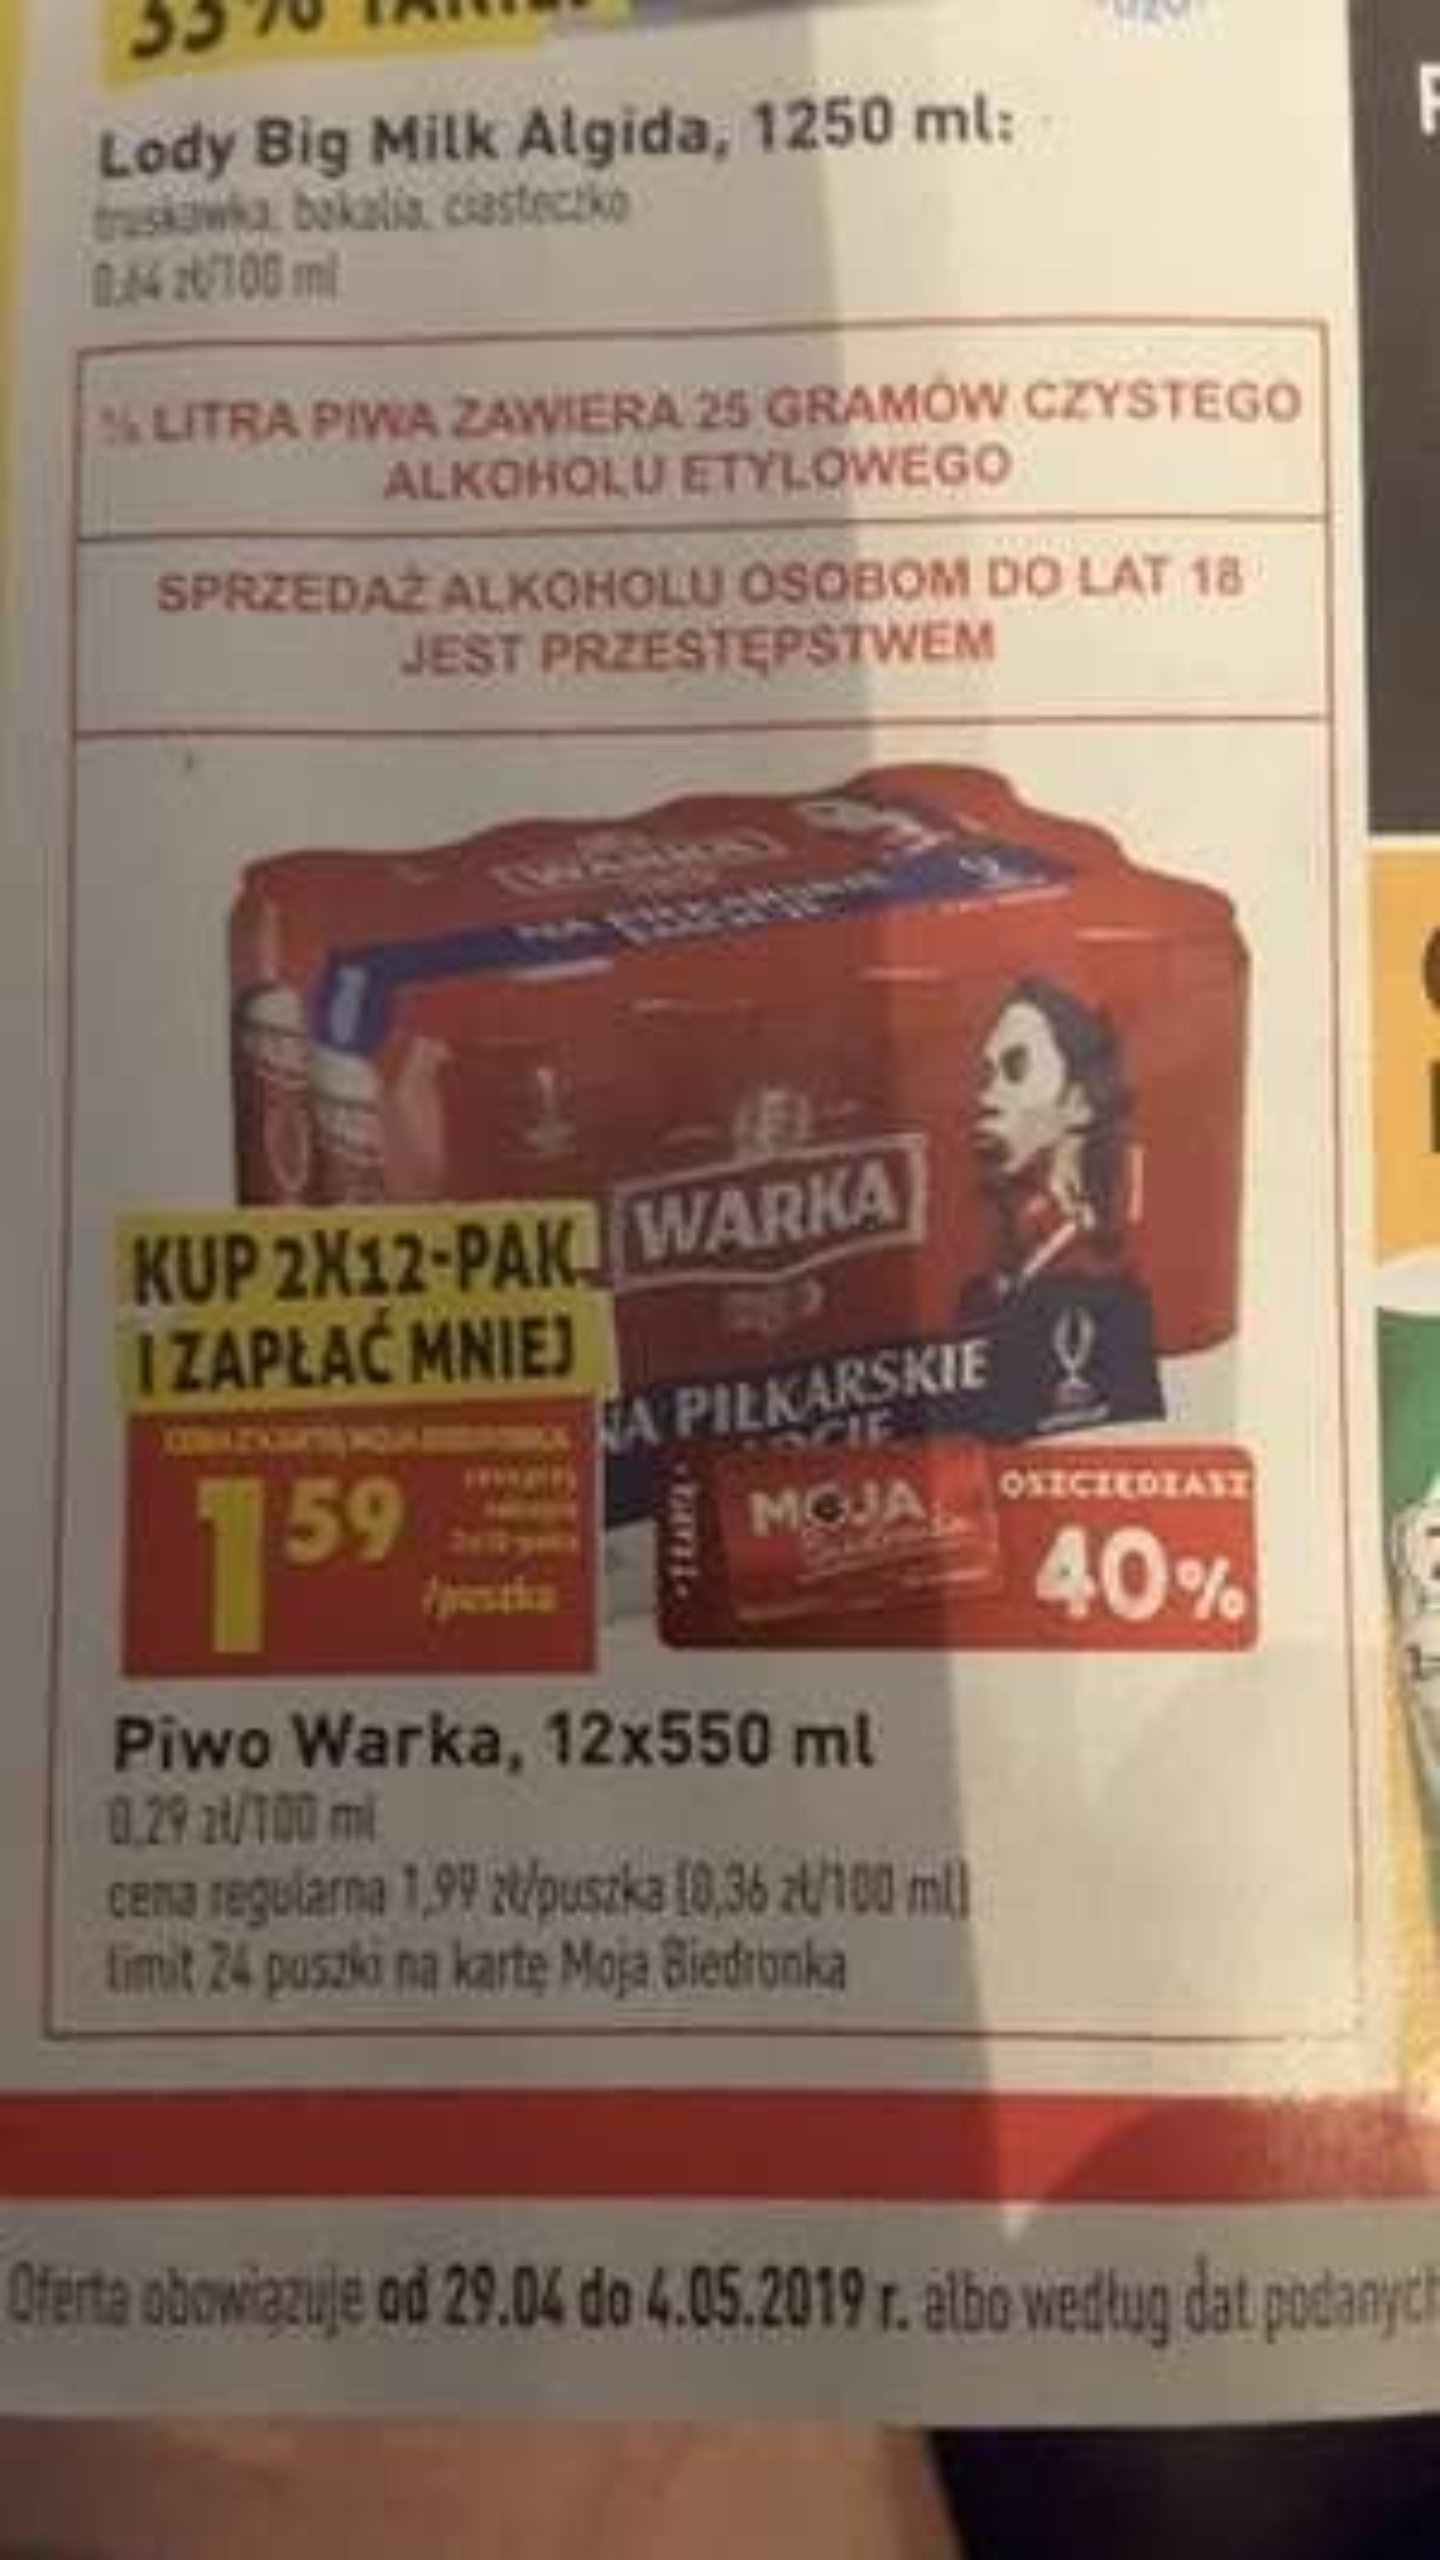 Piwo Warka, puszka 550 ml,  Biedronka